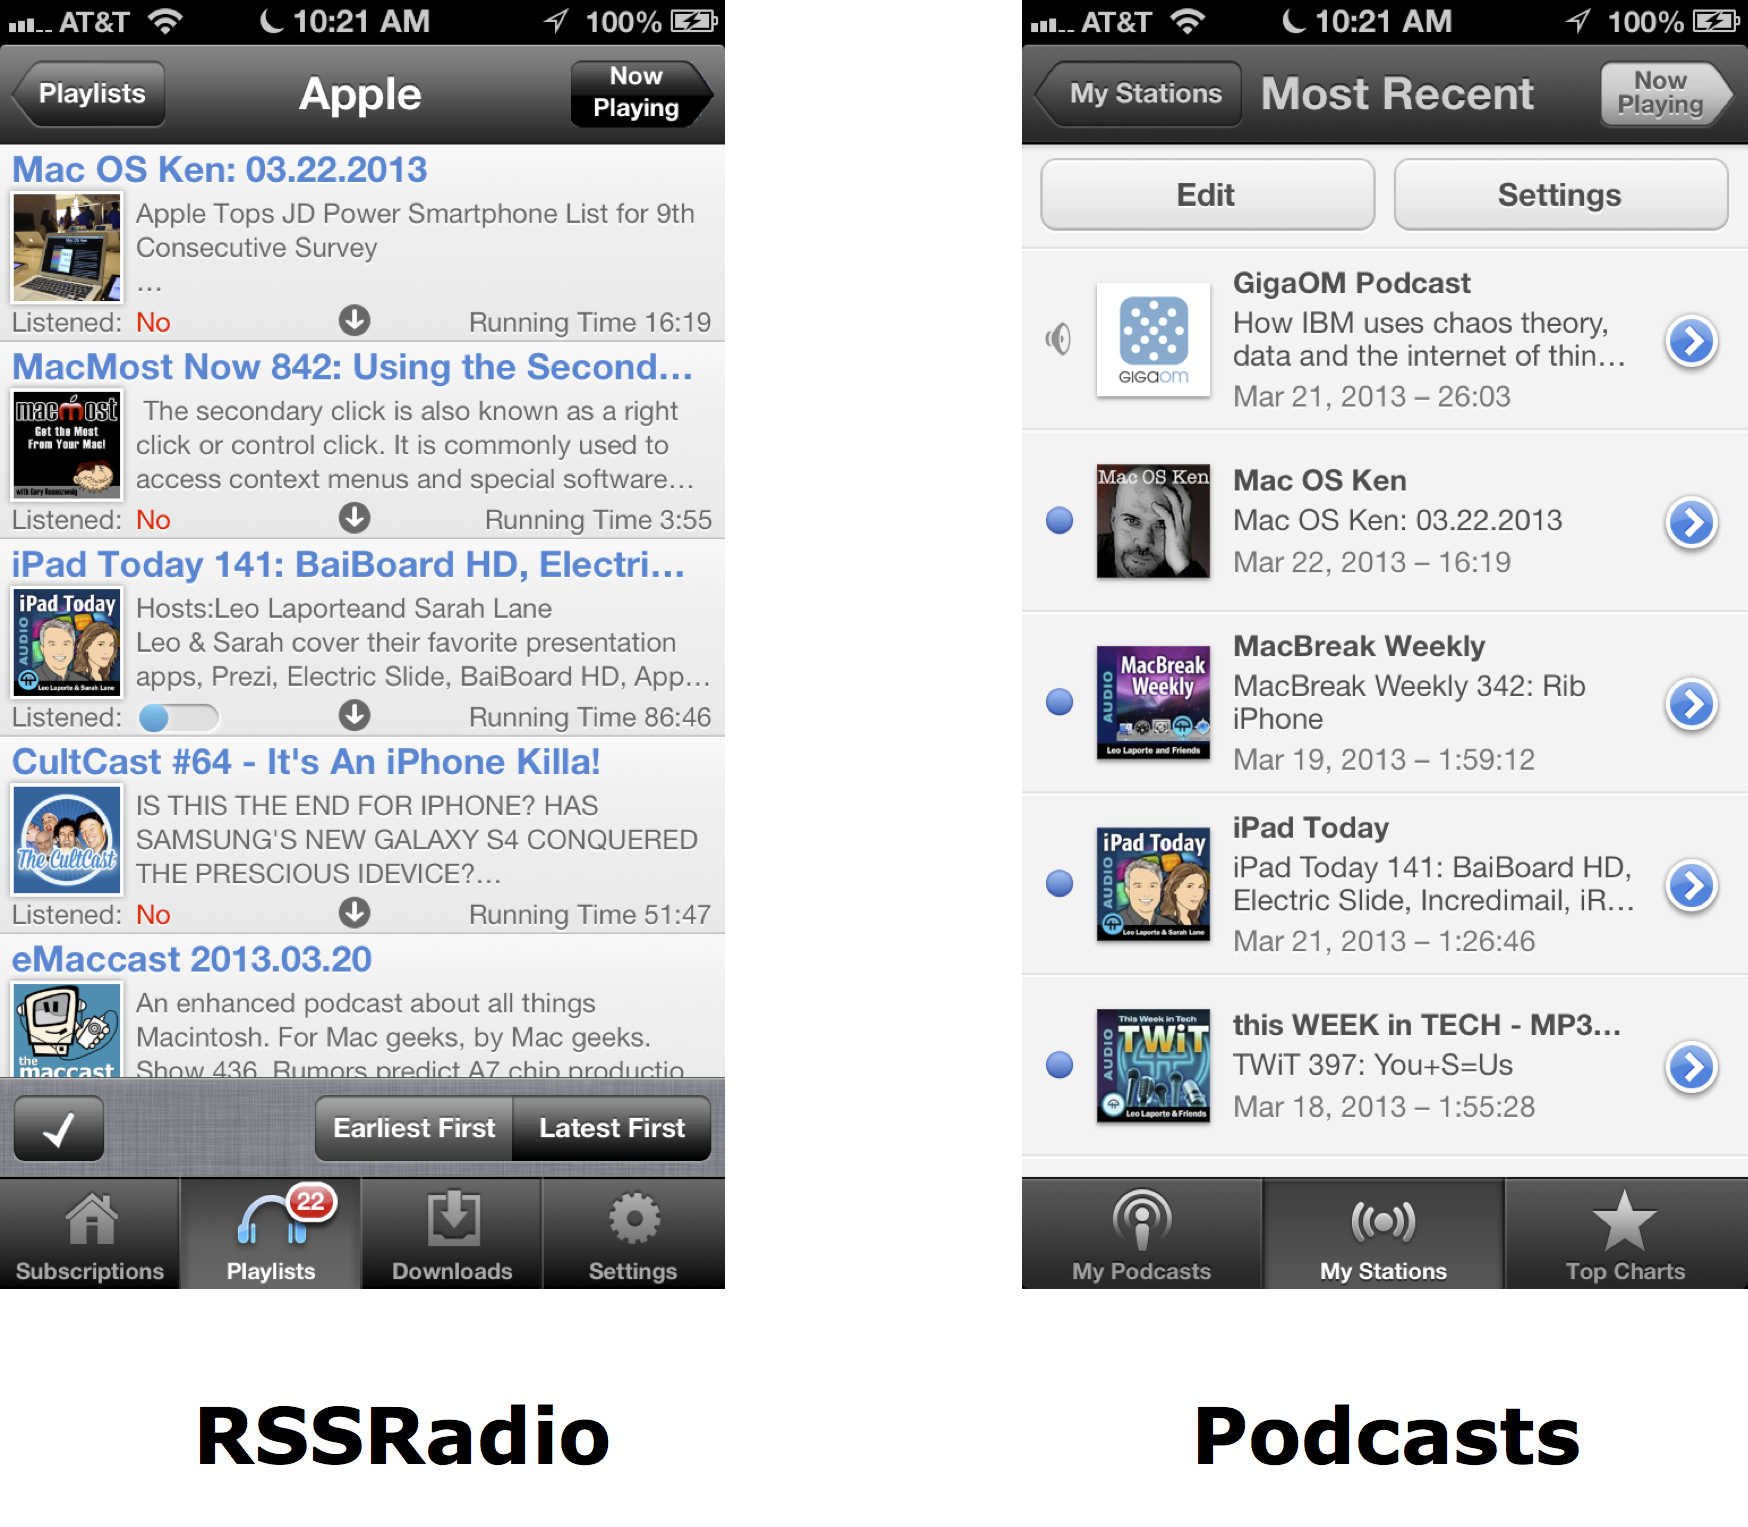 Podcast Playlist